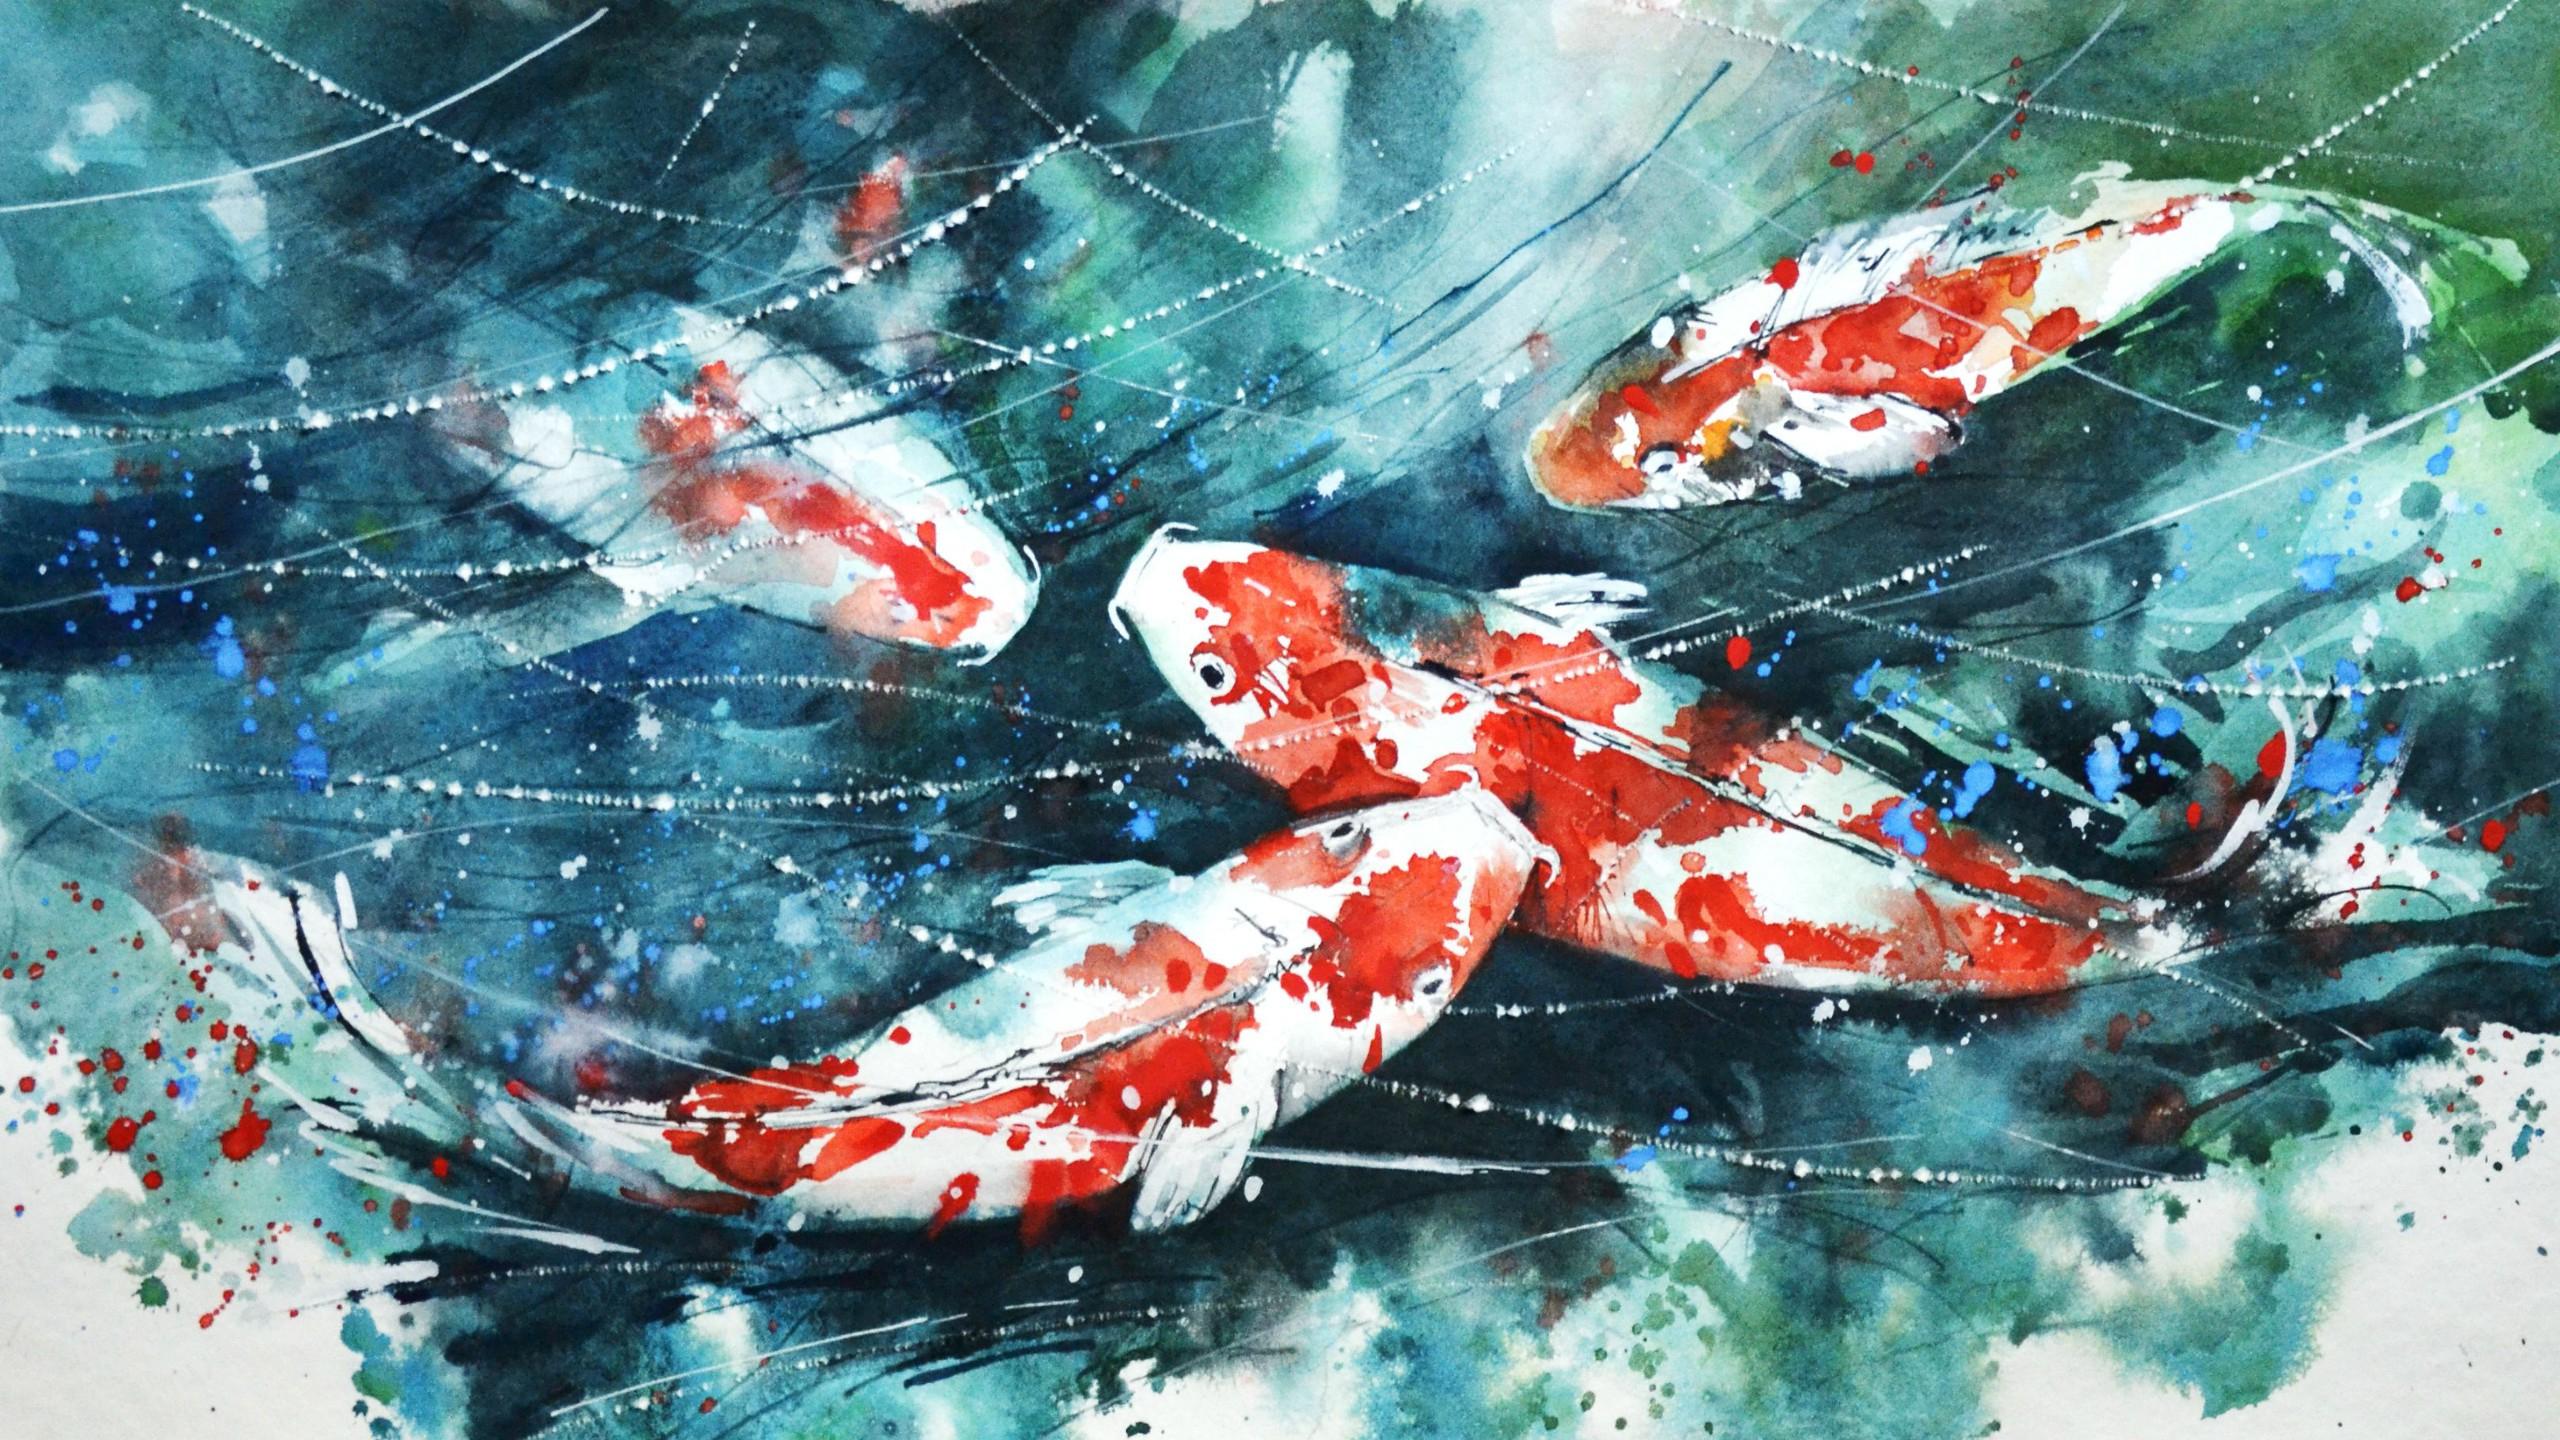 2560x1440 Koi Fish Watercolor Painting Painting, Fish, Watercolor, Koi